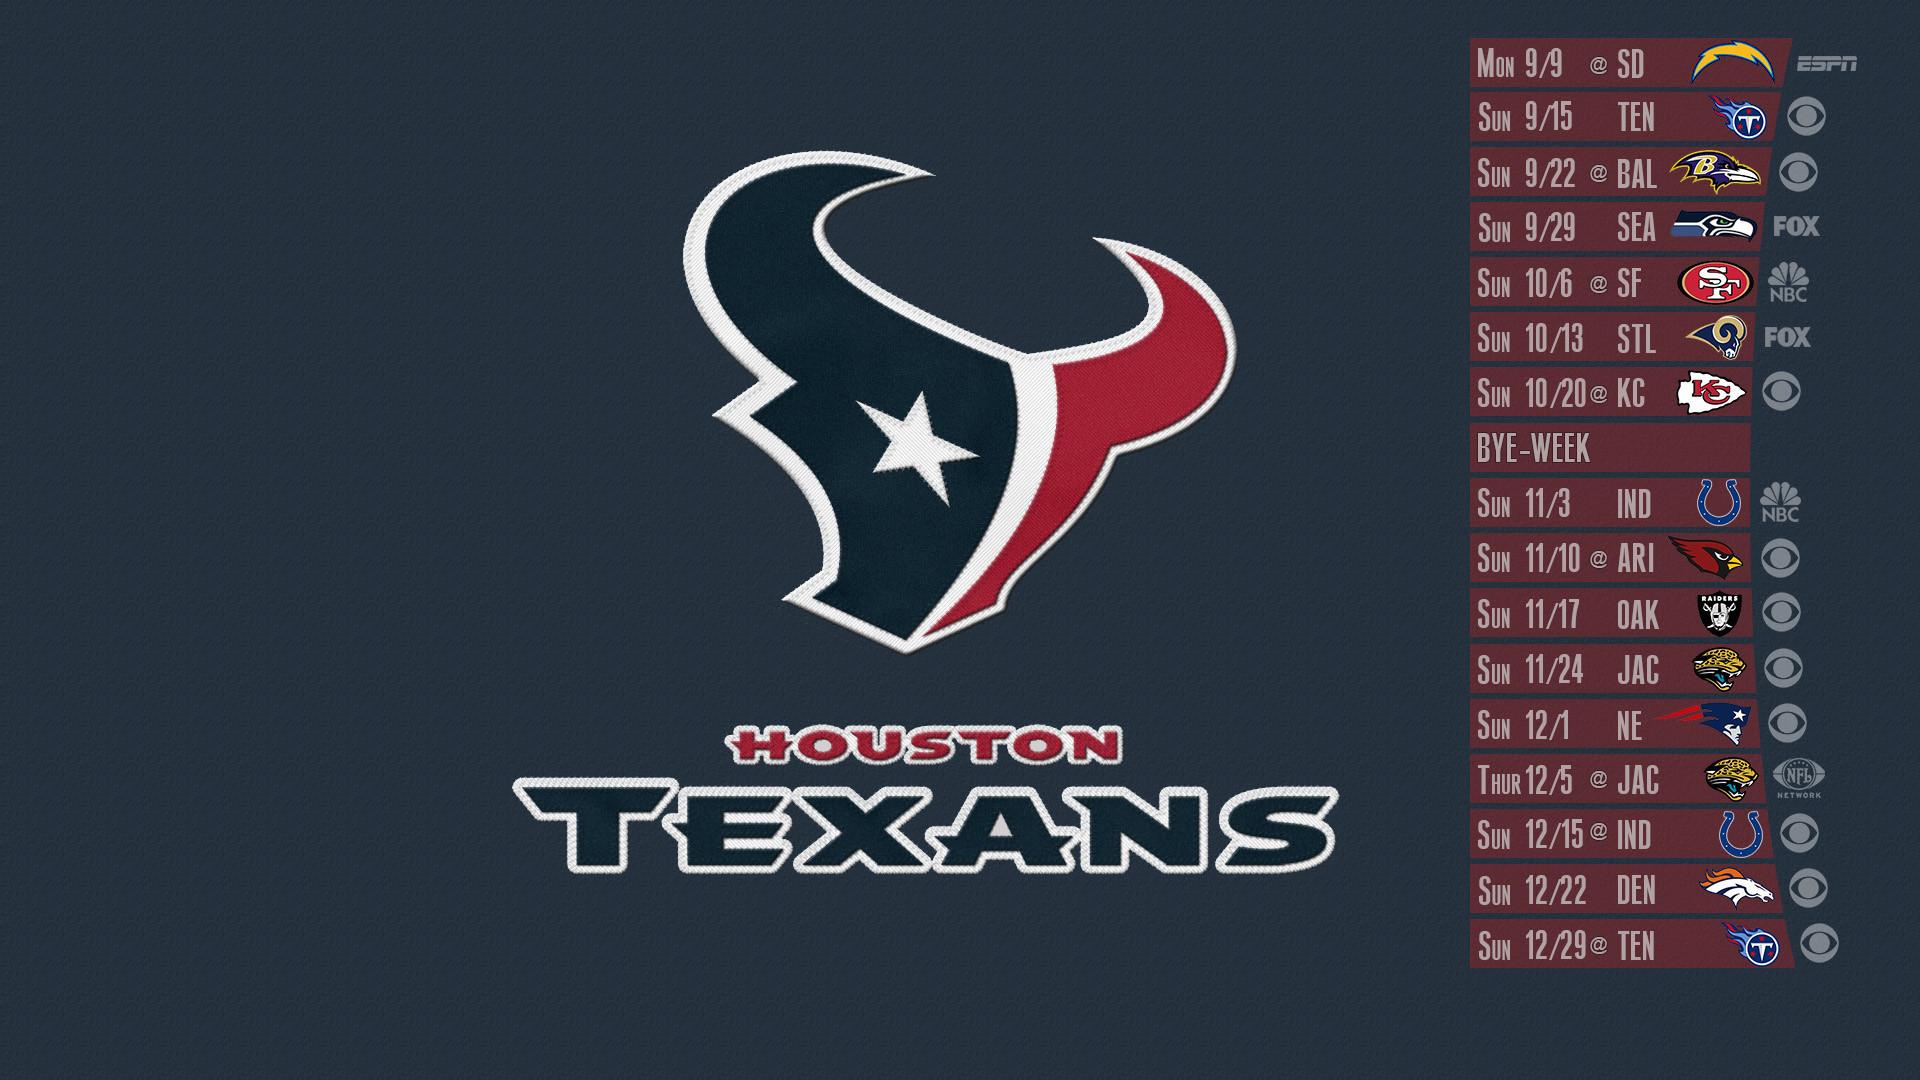 Houston Texans Wallpaper 2018 (73+ images)